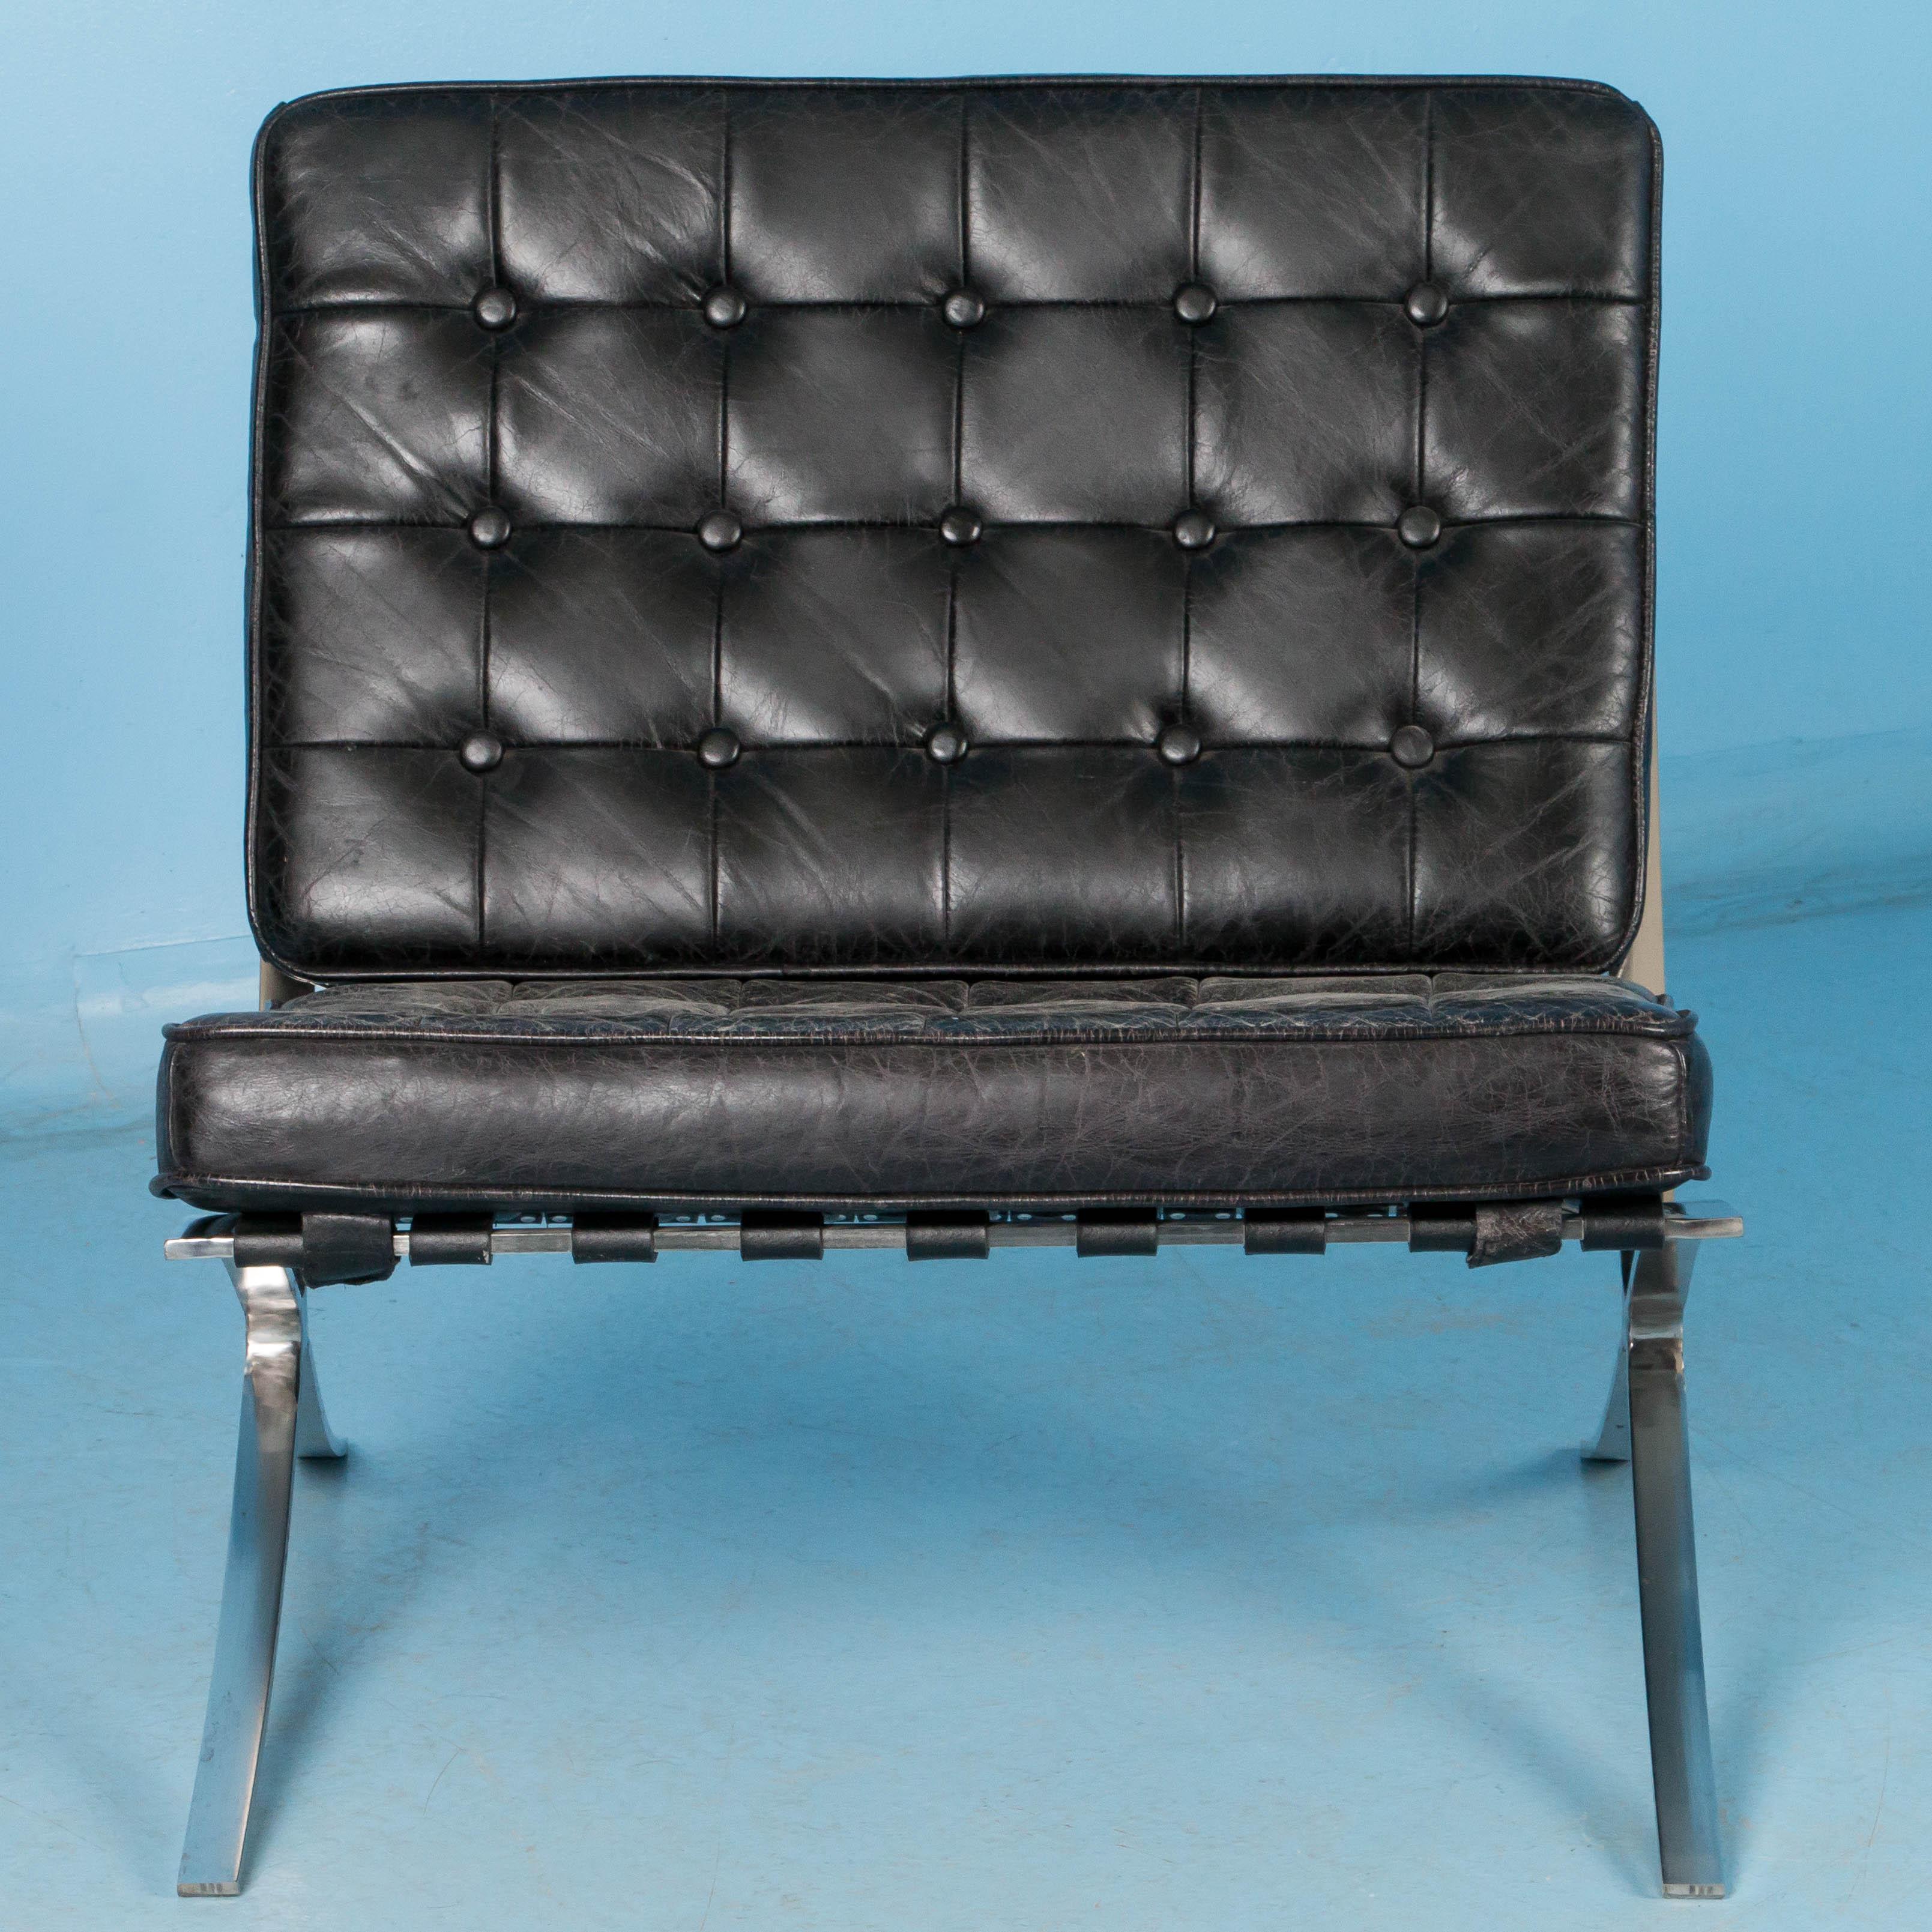 barcelona chair leather wheelchair diagram black style with chrome frame